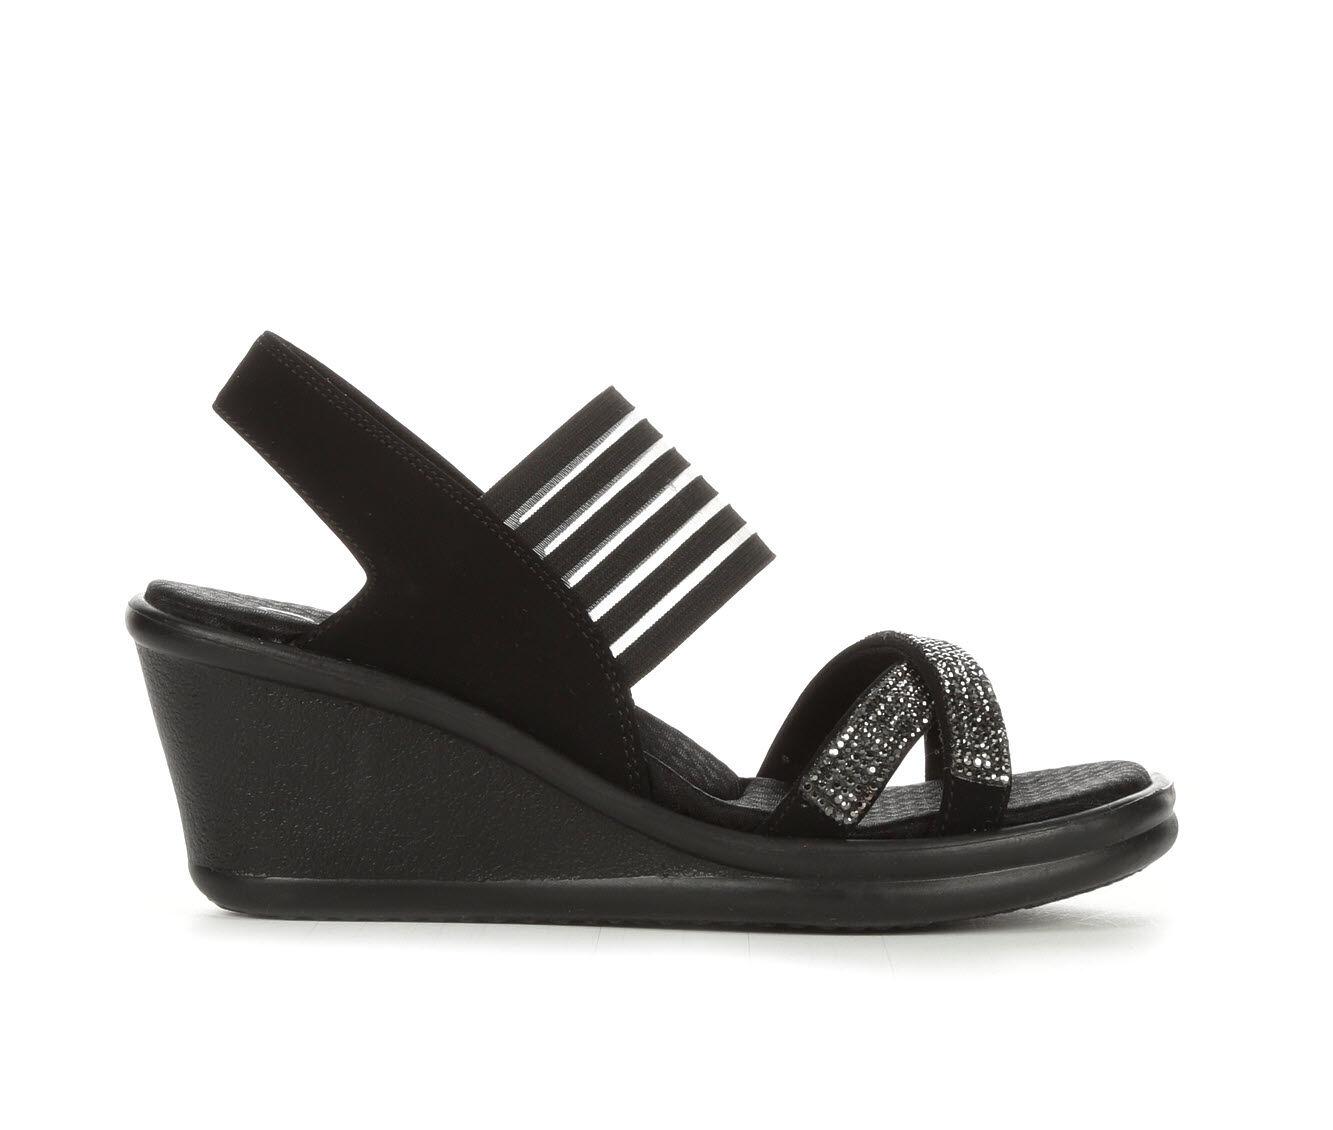 Women's Skechers Cali Rumblers Modern Maze Wedge Sandals